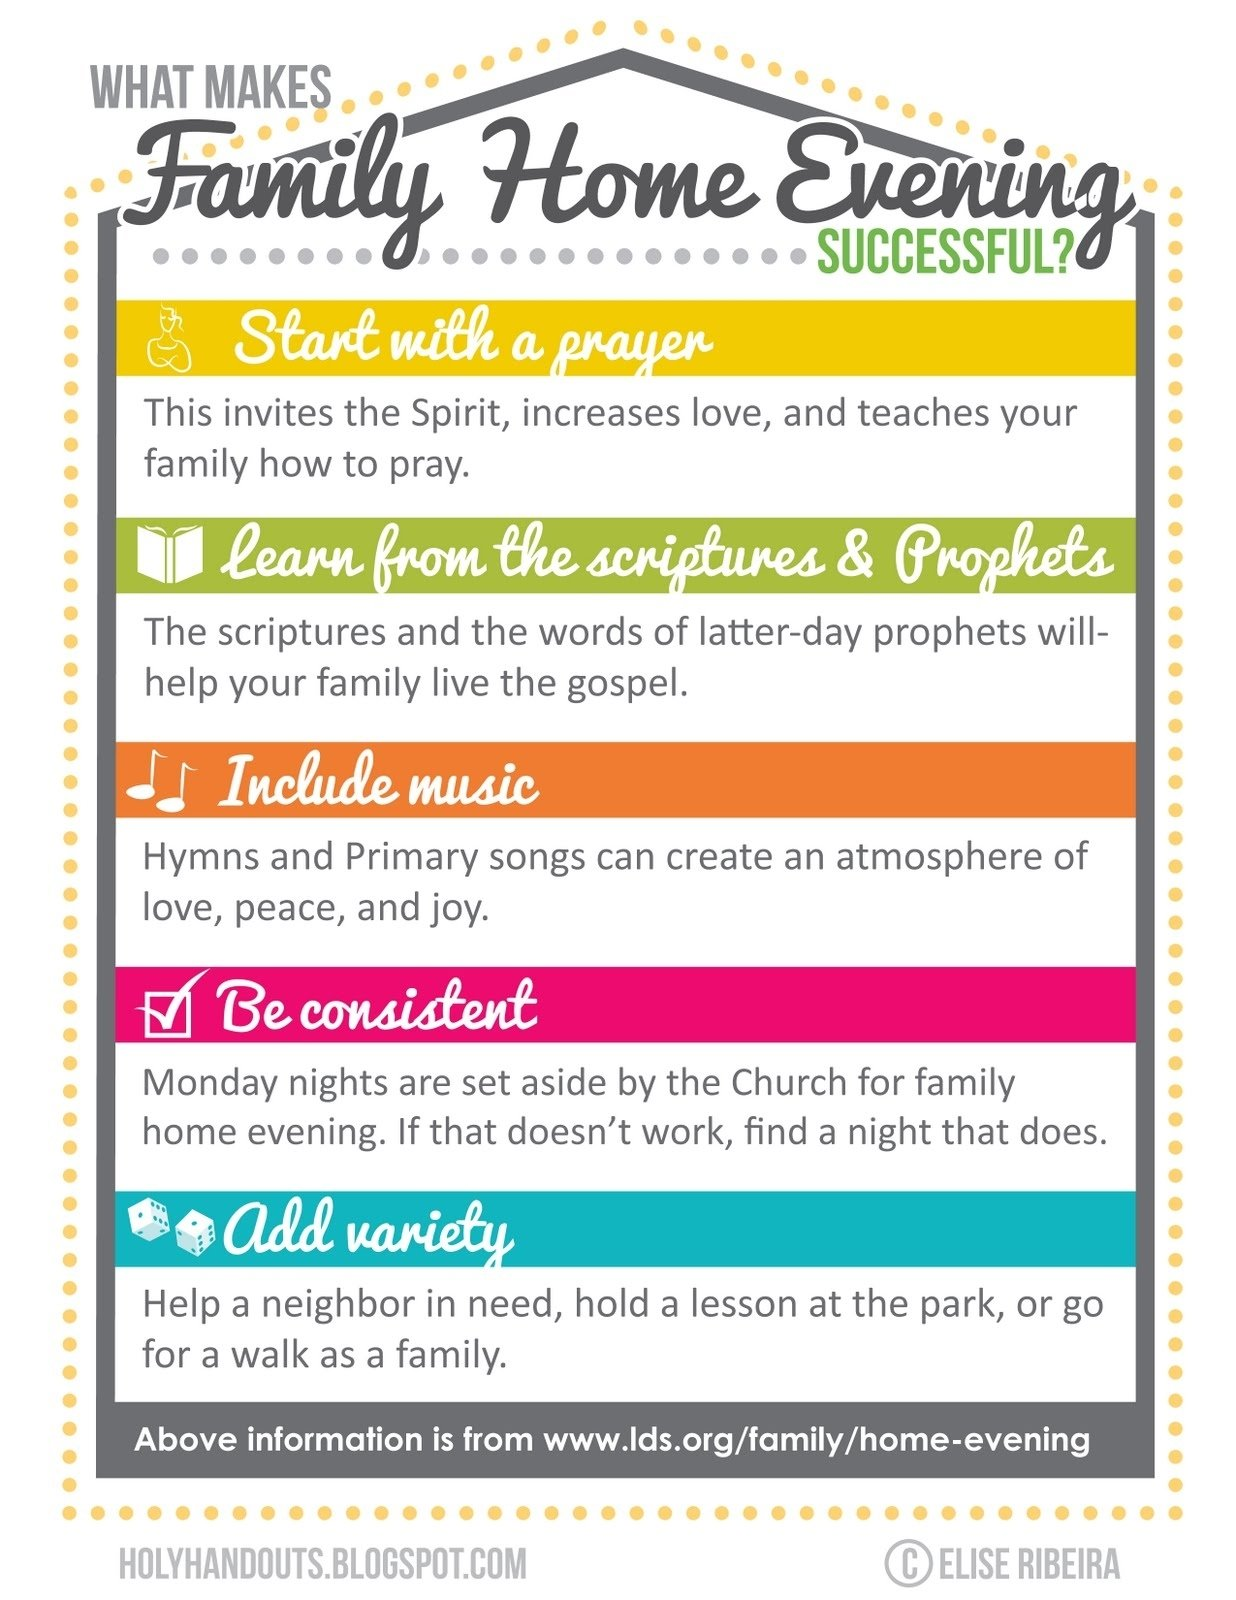 10 Unique Family Home Evening Lesson Ideas homey family home evening ideas lesson on charity lds boutique 1